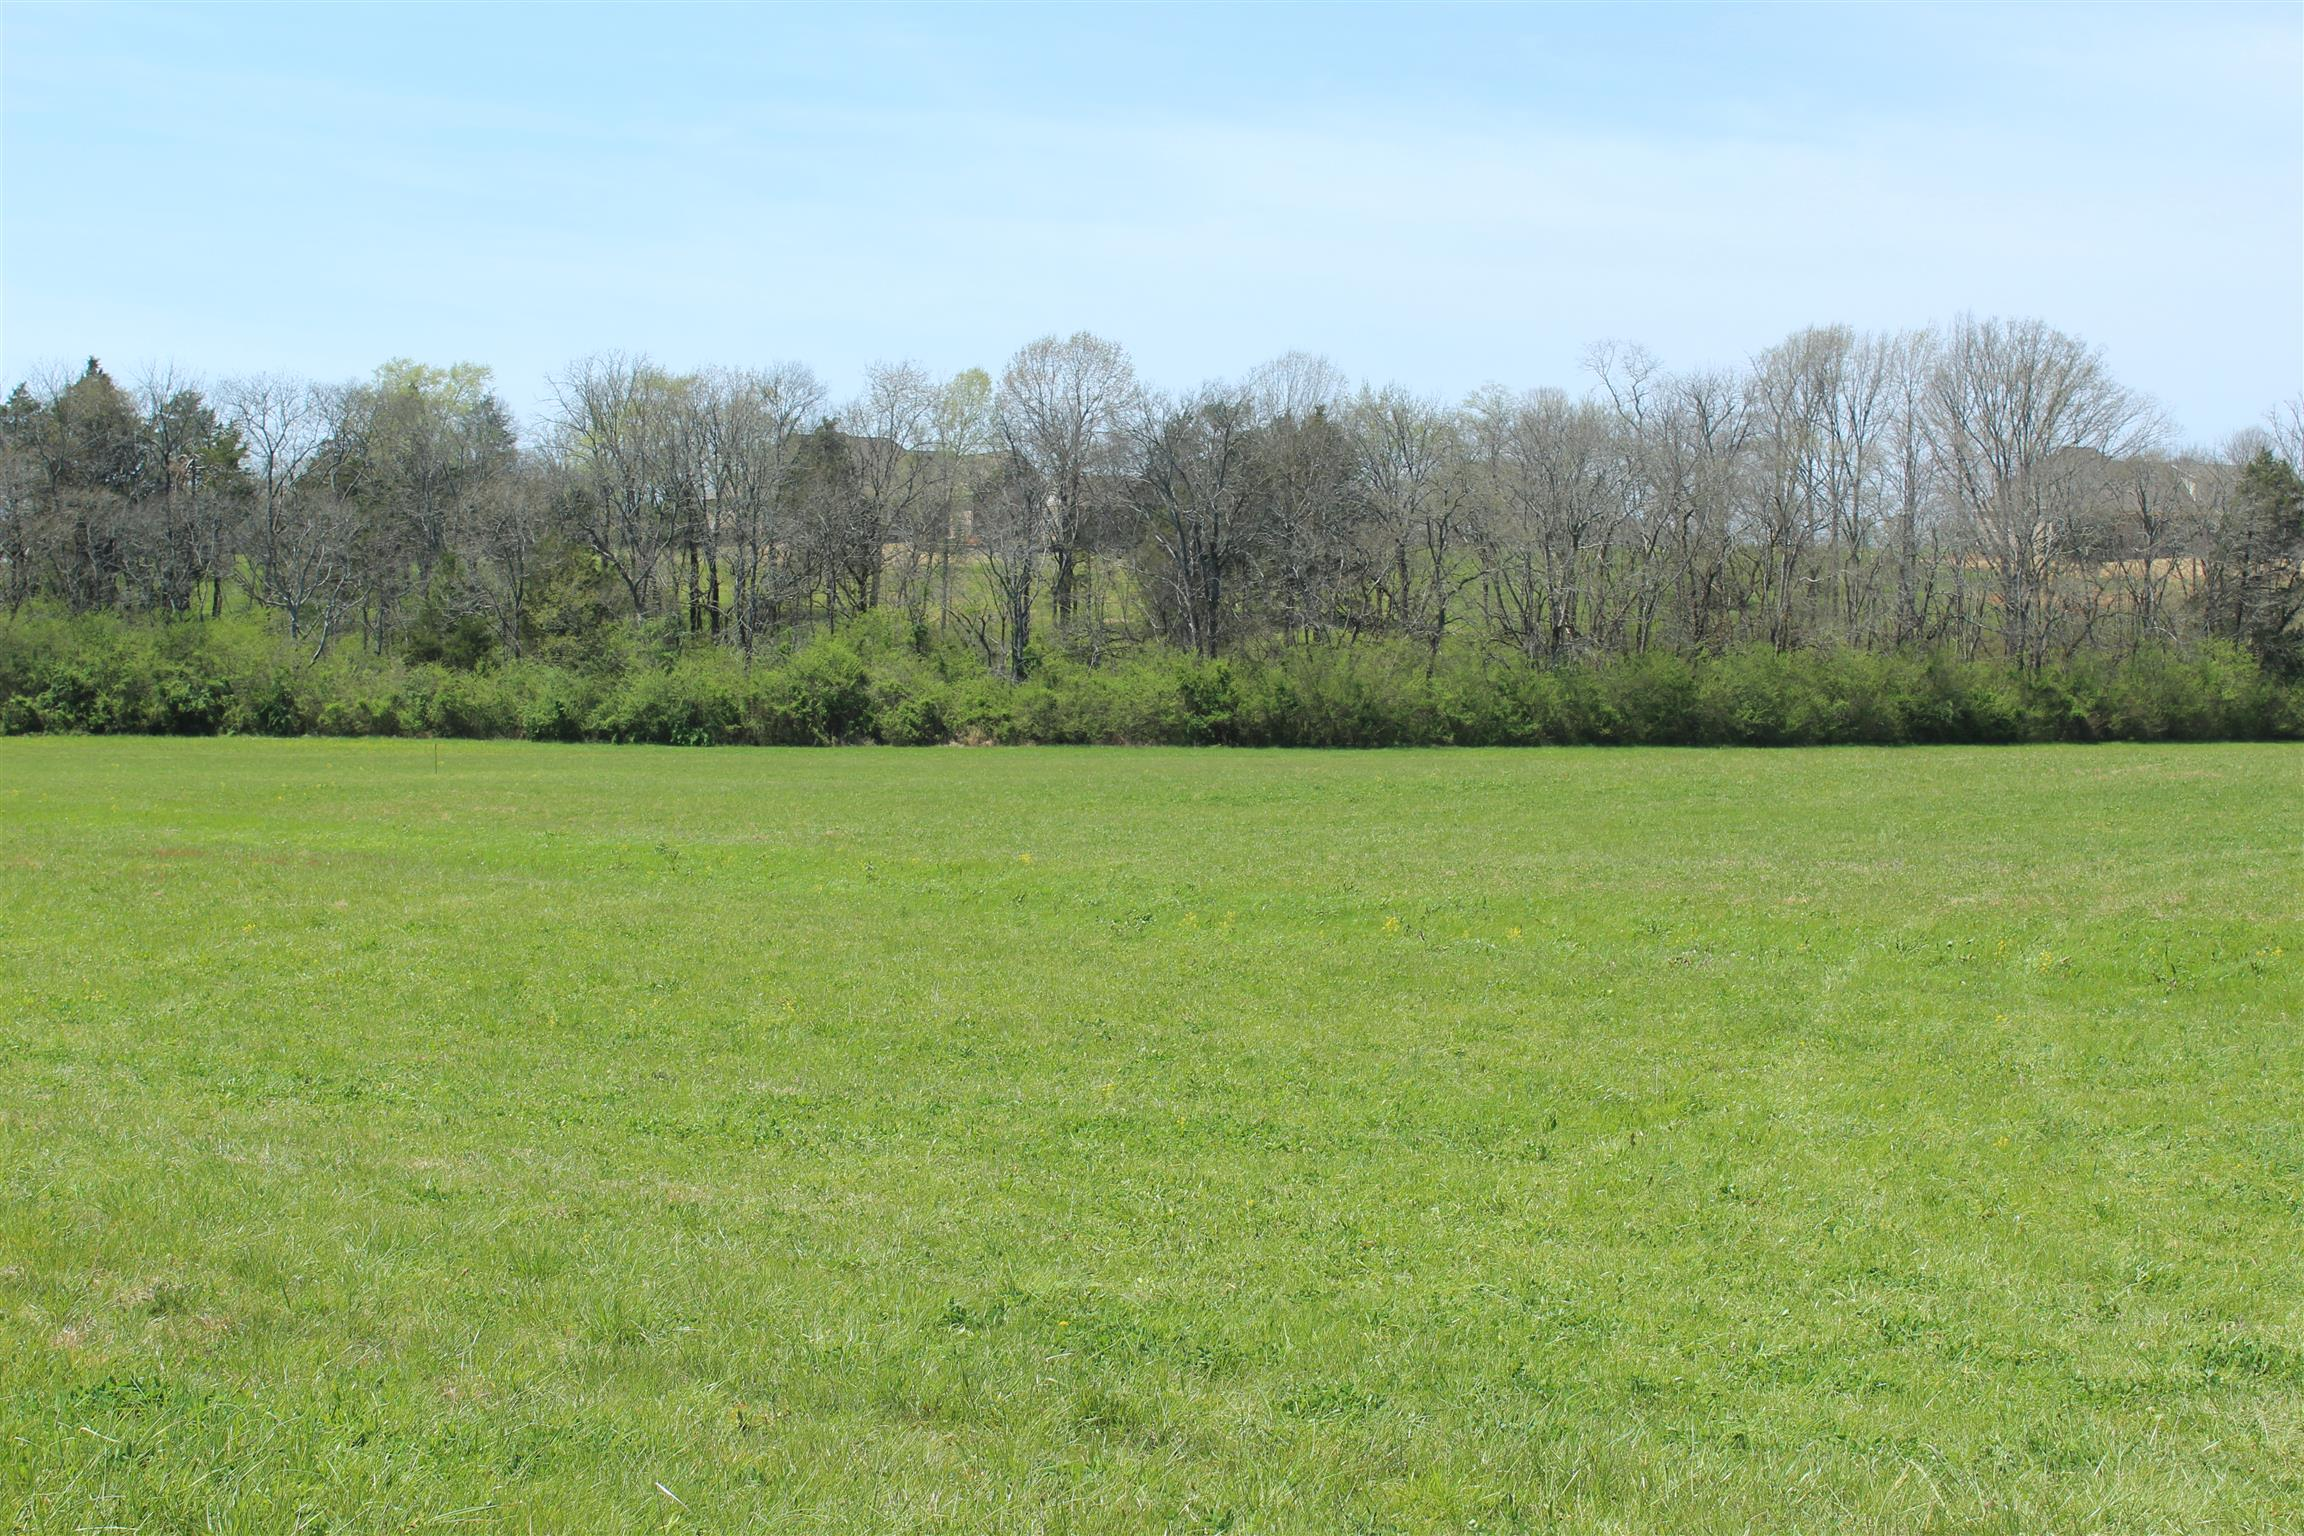 3 Highway 64, Beechgrove, TN 37018 - Beechgrove, TN real estate listing